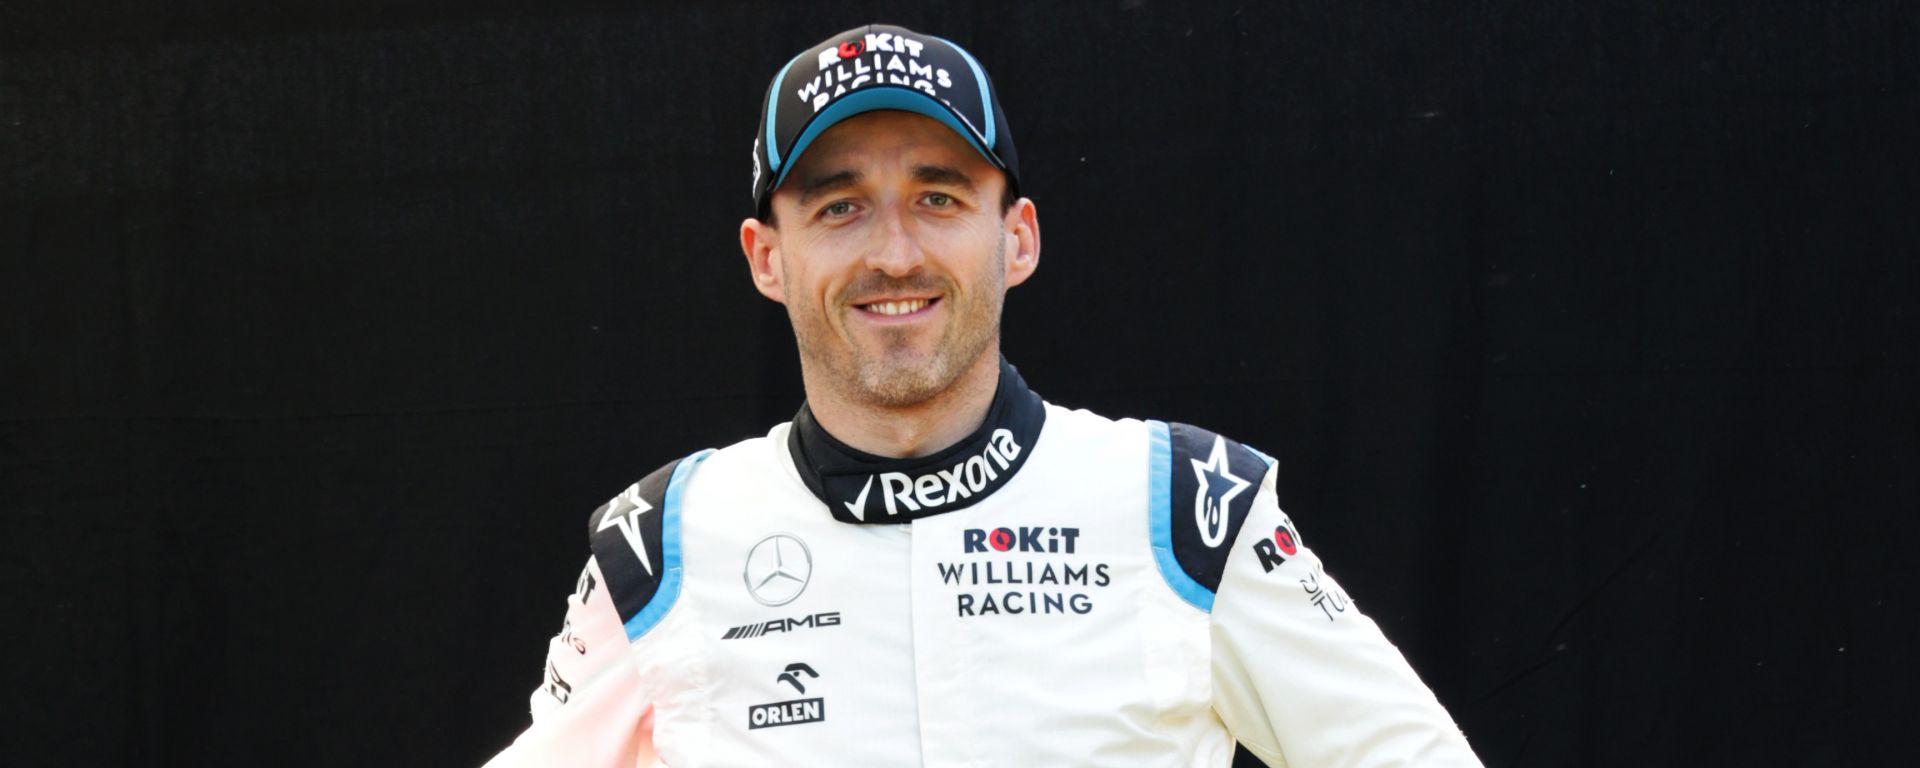 Robert Kubica #88 F1 2019